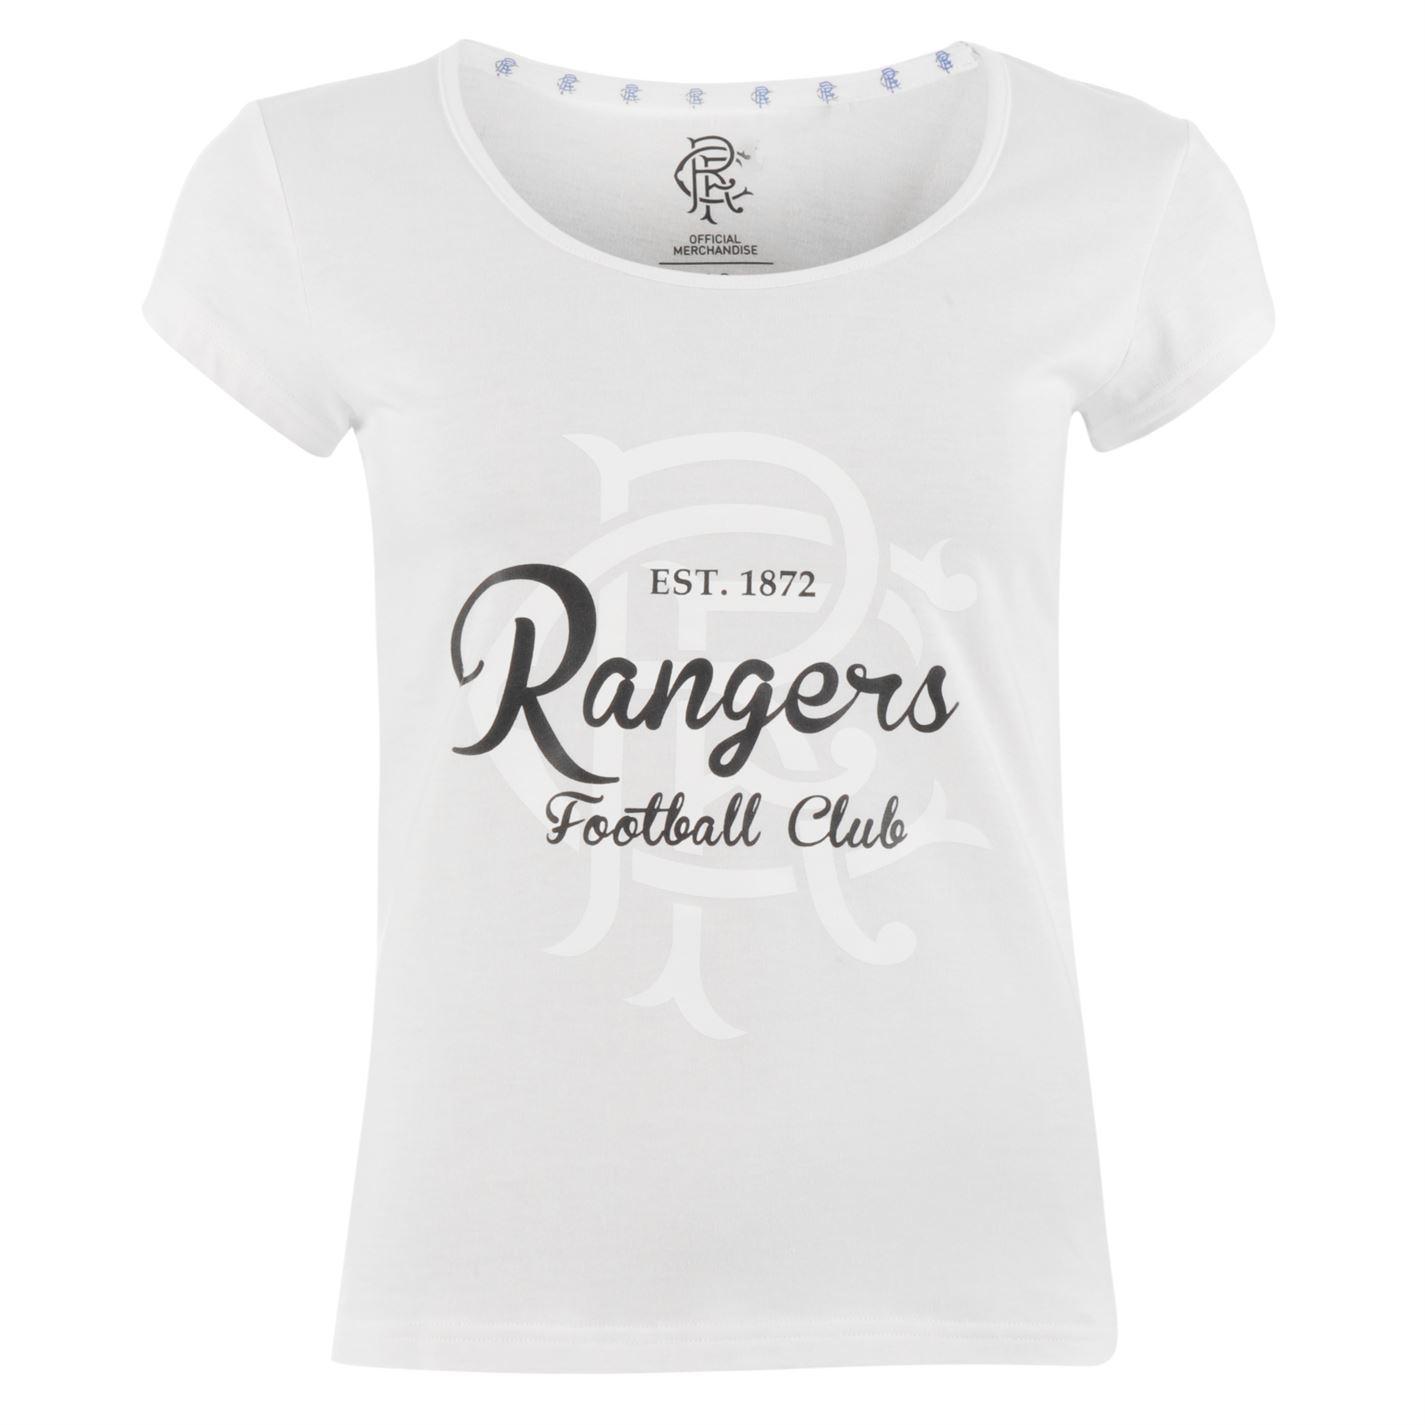 Camiseta Shirt Cresta Glasgow Rangers Impresión Fan T Fútbol Mujer OAgOnW8px